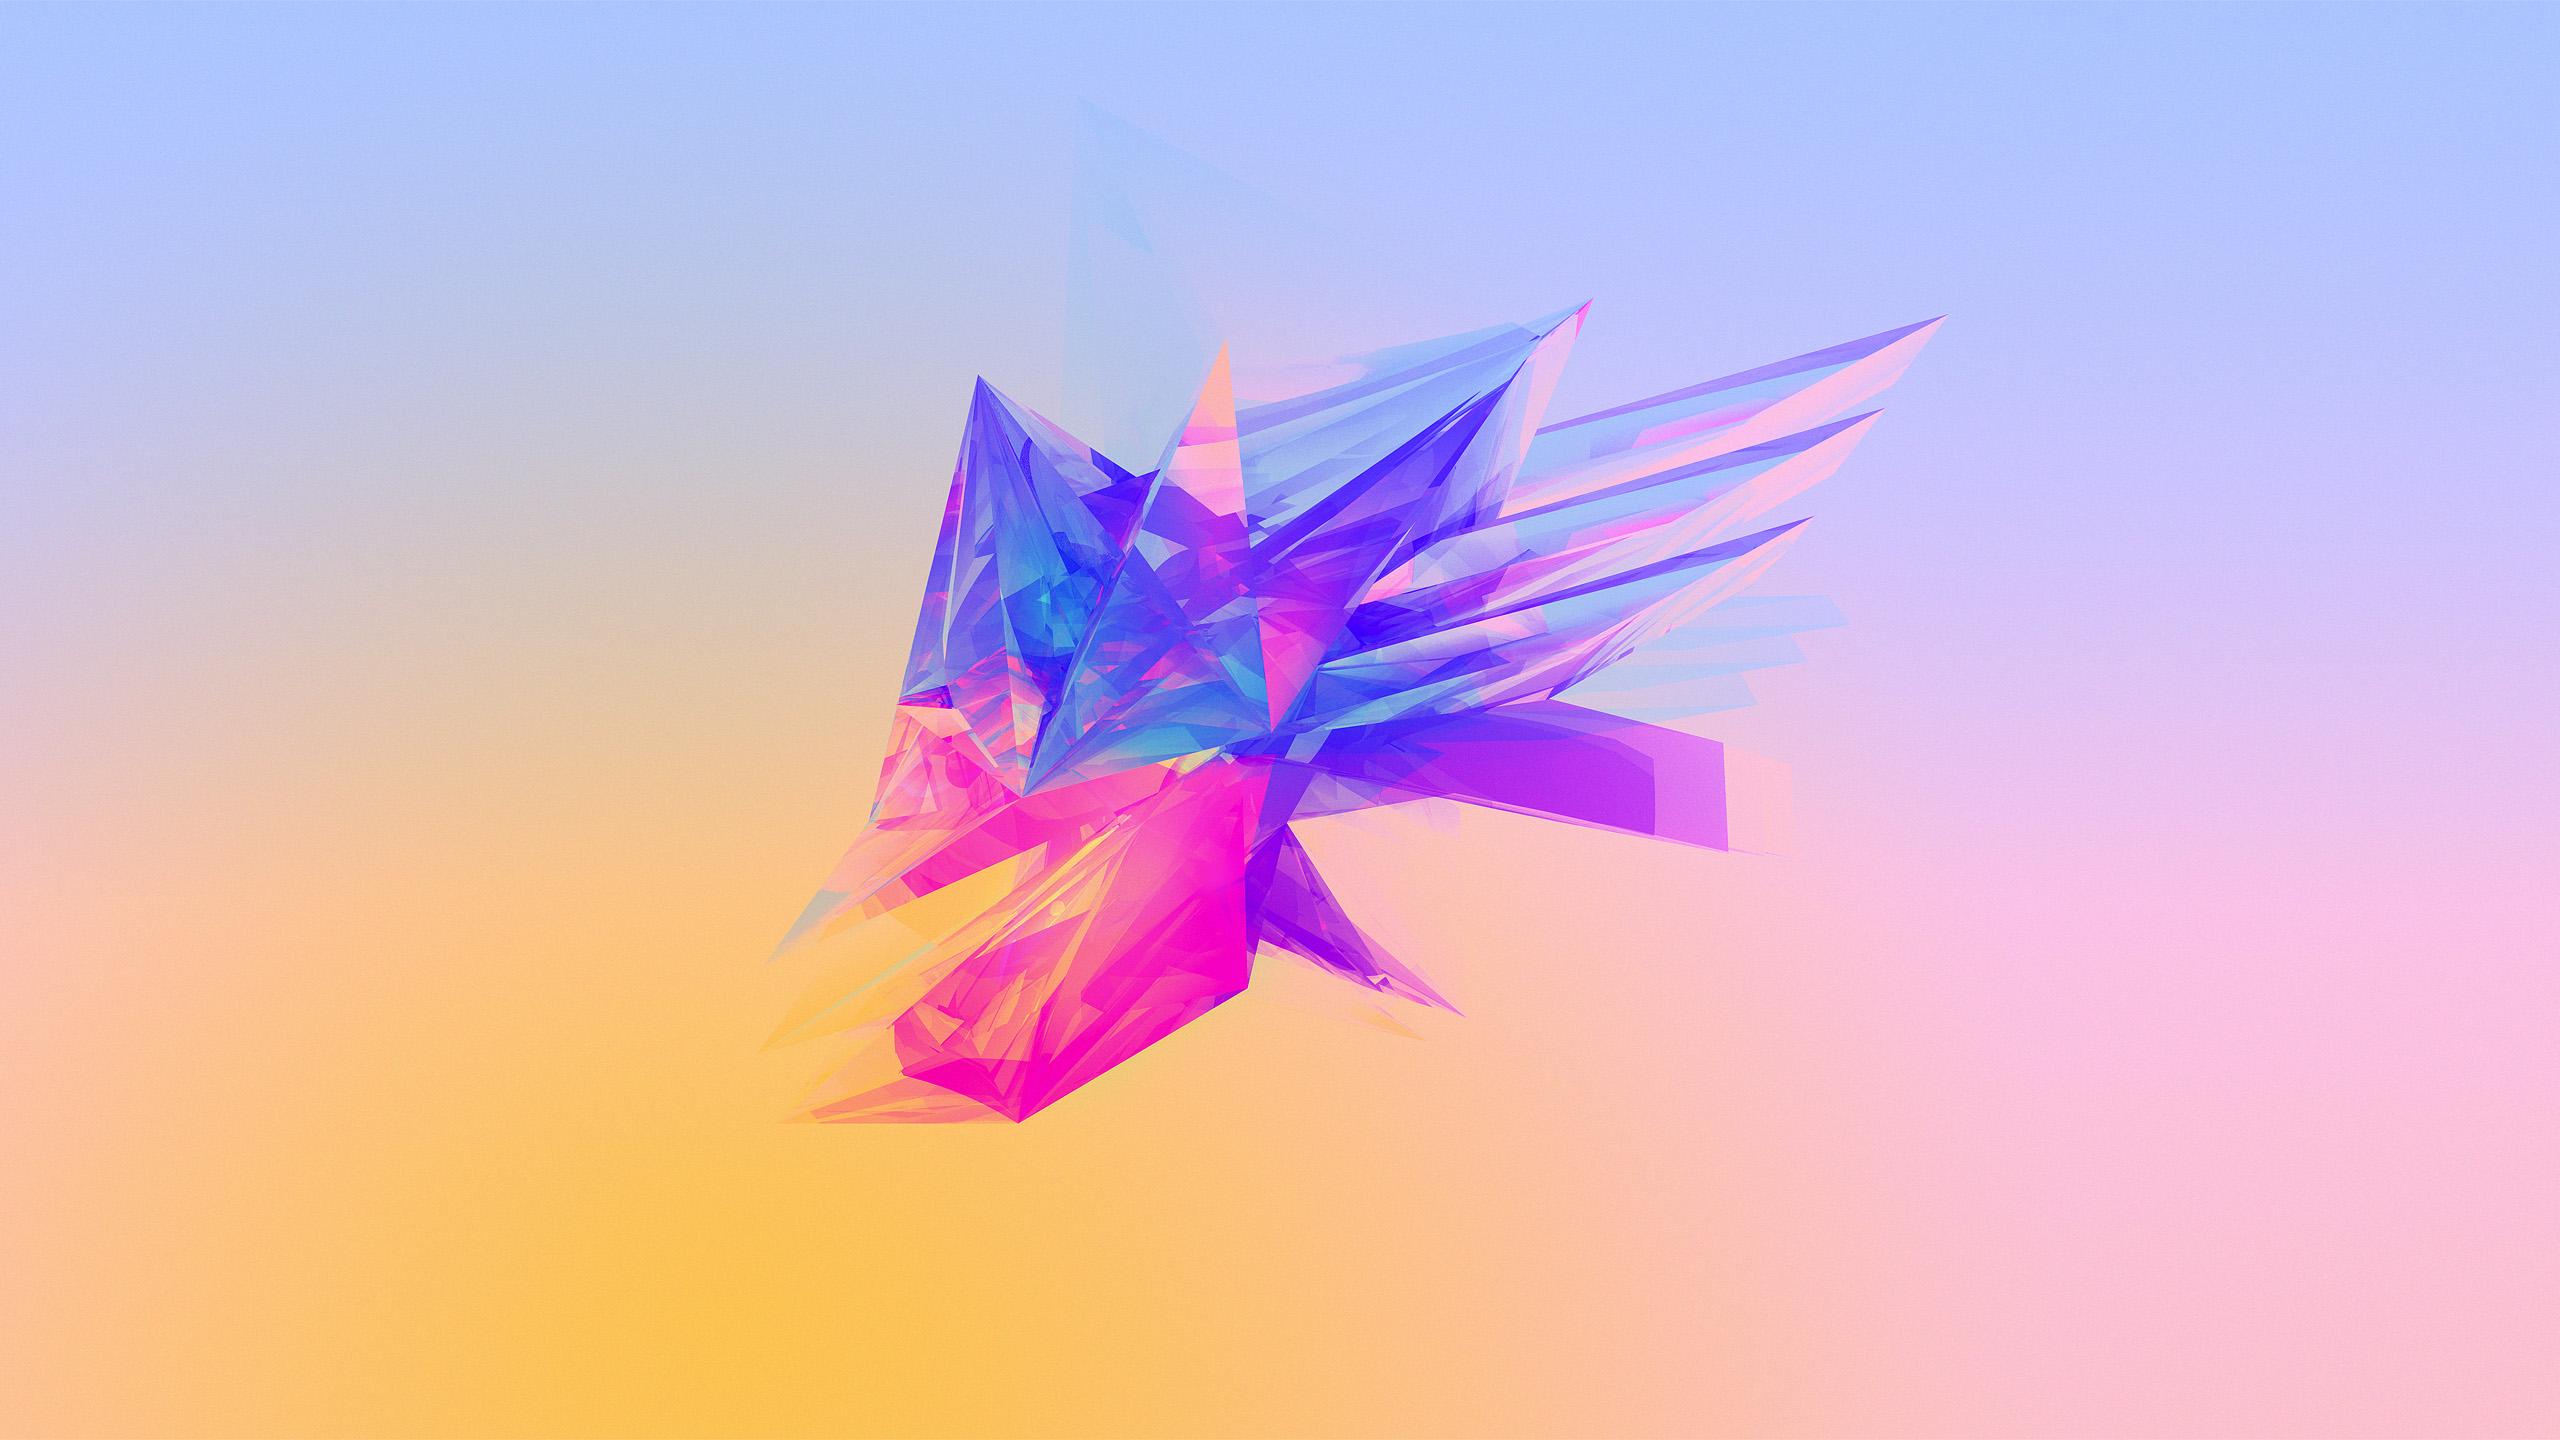 Wallpaper Illustration Abstract Purple Blue Gradient